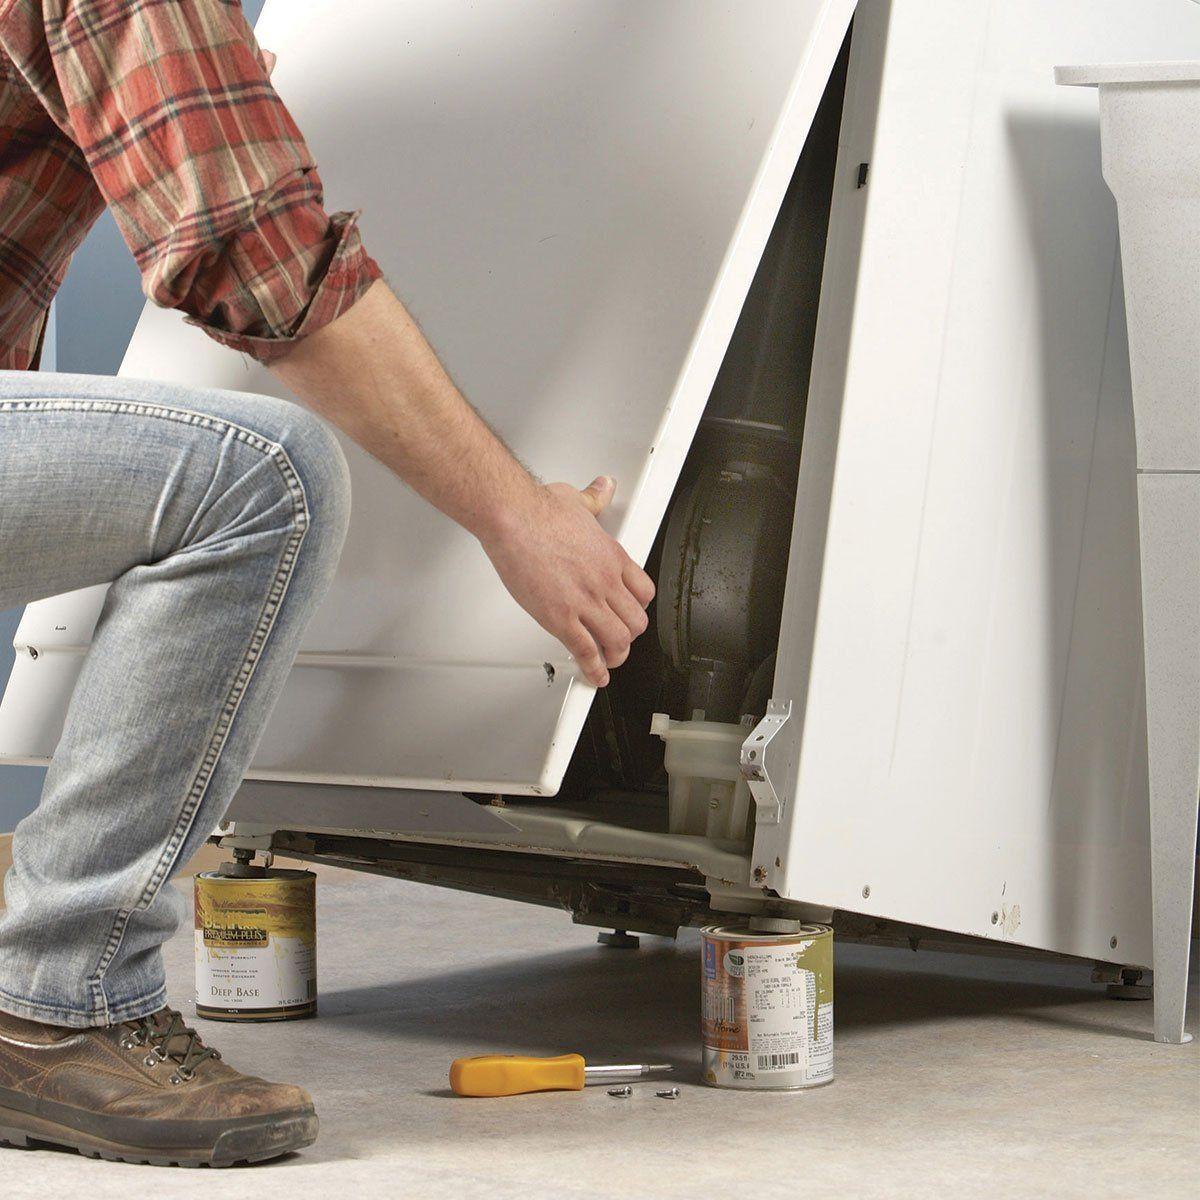 kitchenaid refrigerator troubleshooting codes